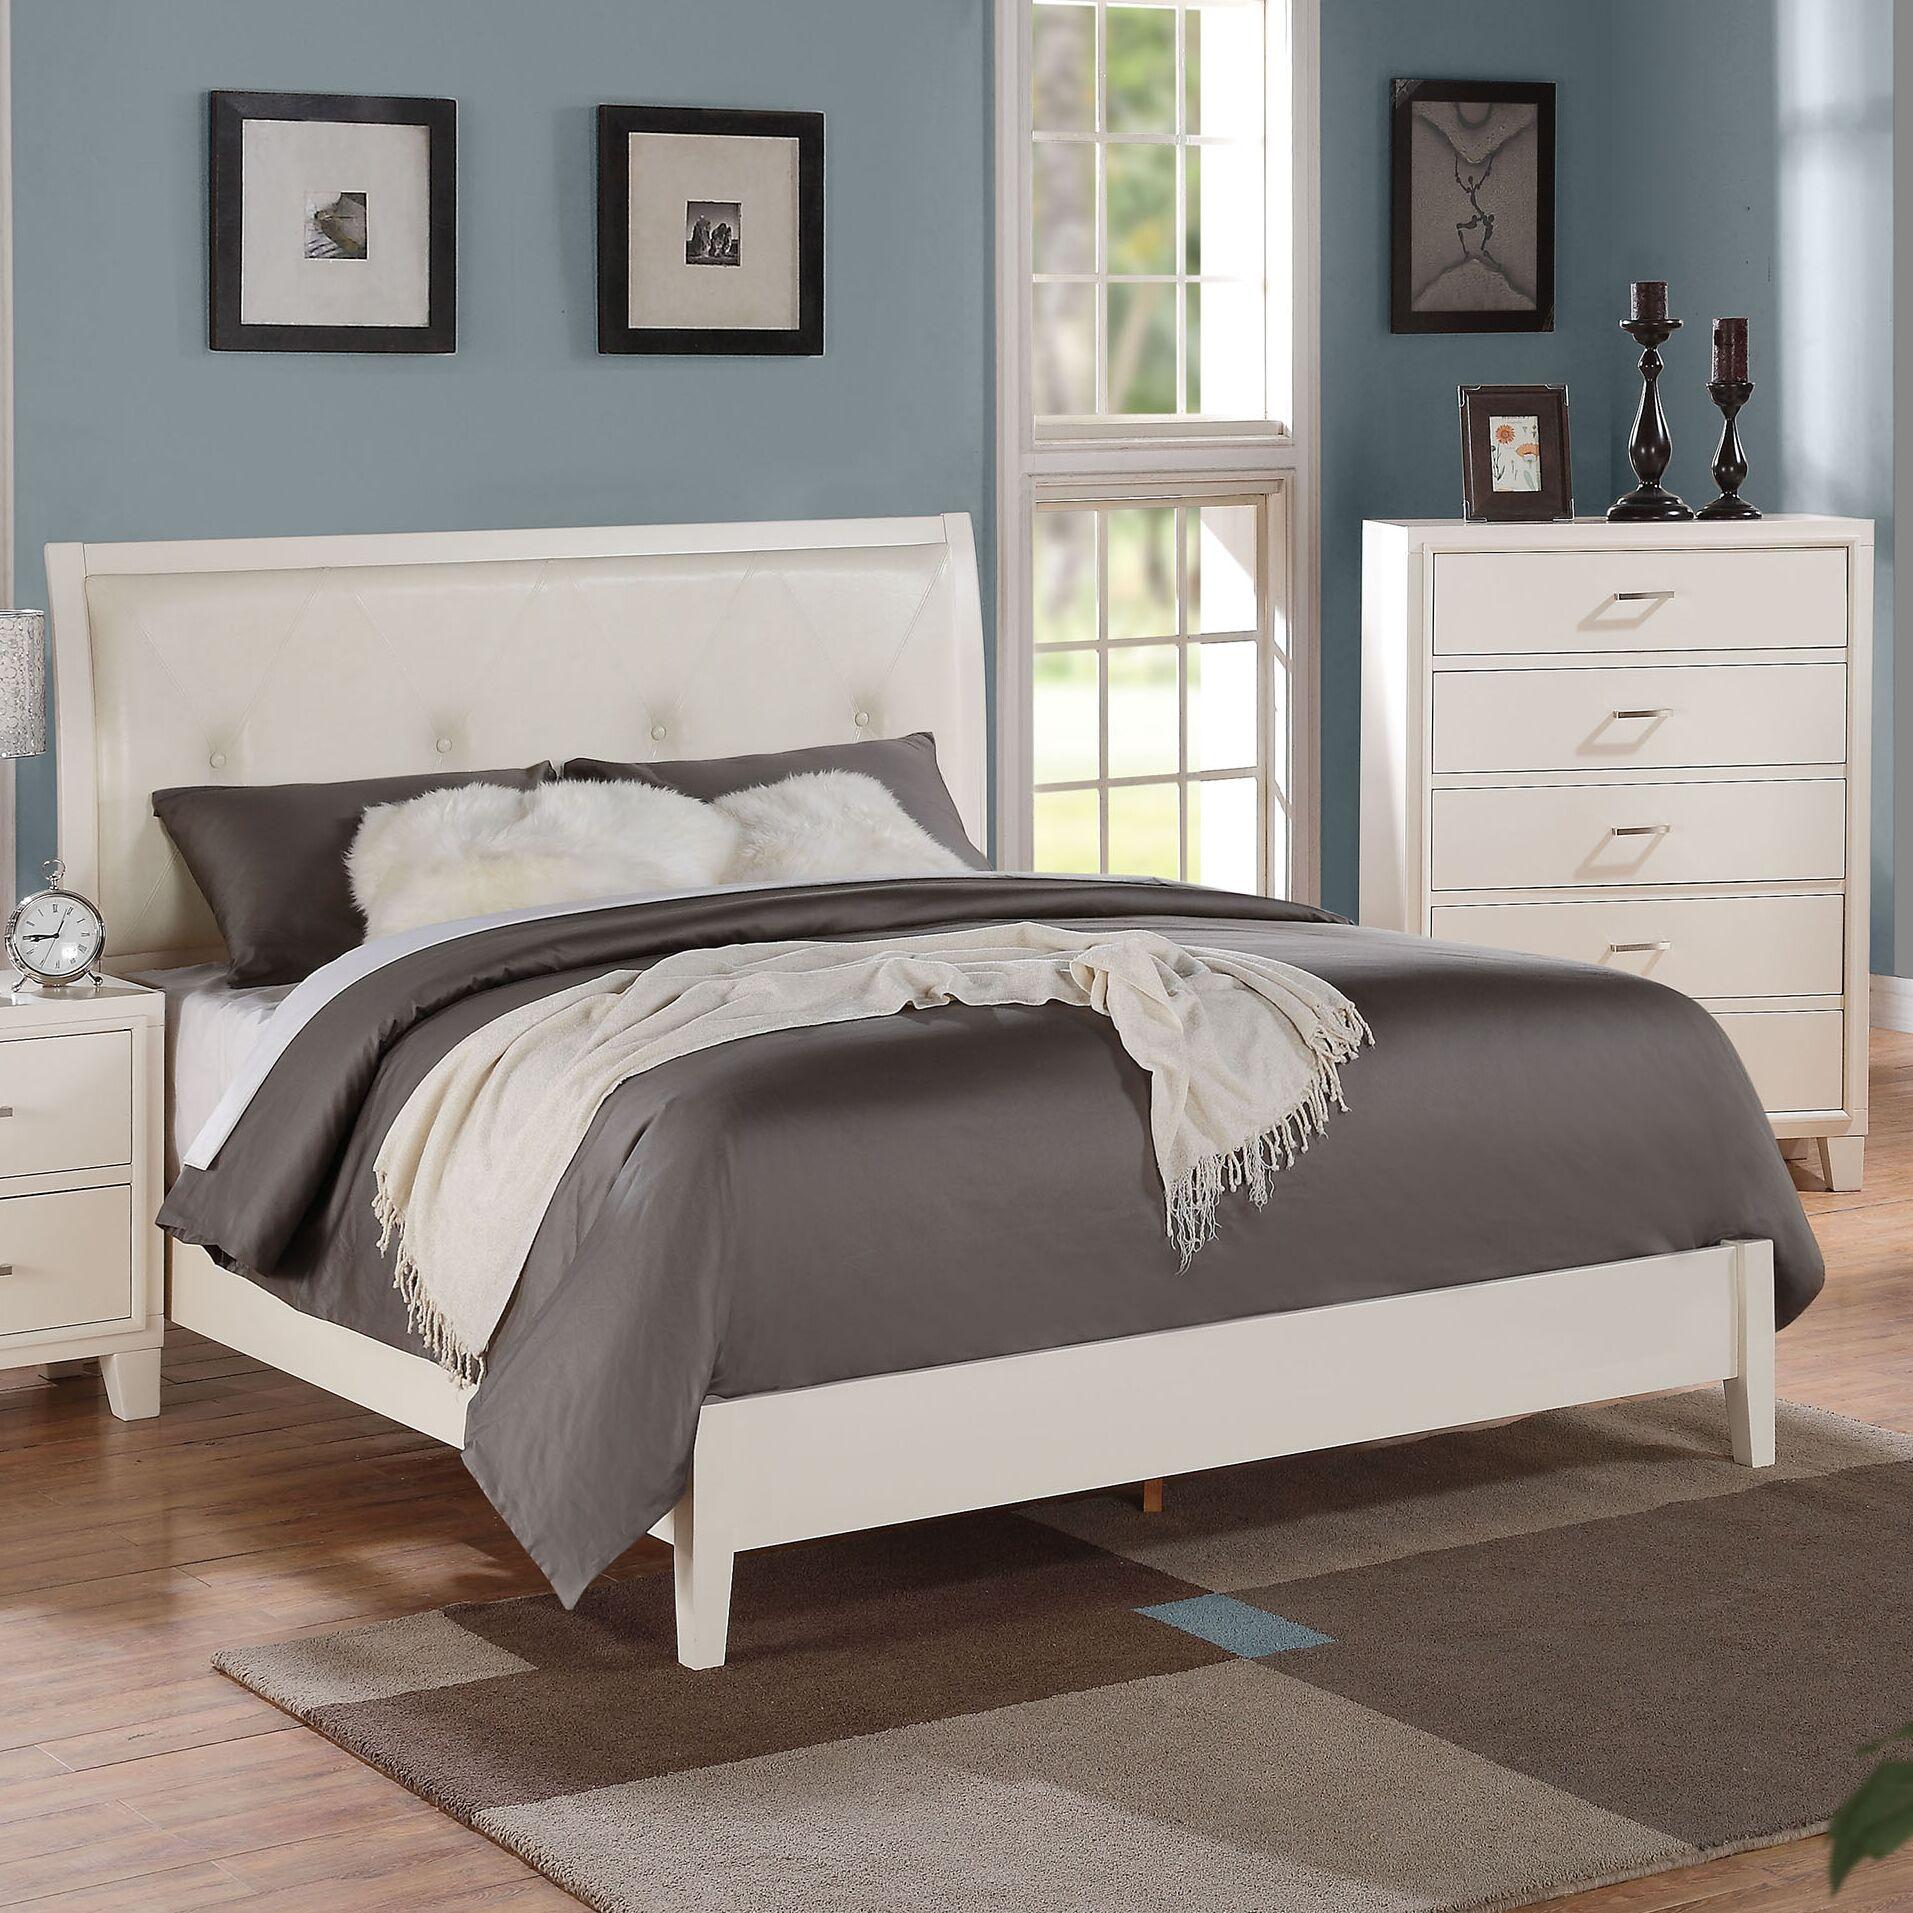 Bari Upholstered Panel Bed Color (Frame/Headboard): White/Cream, Size: Eastern King